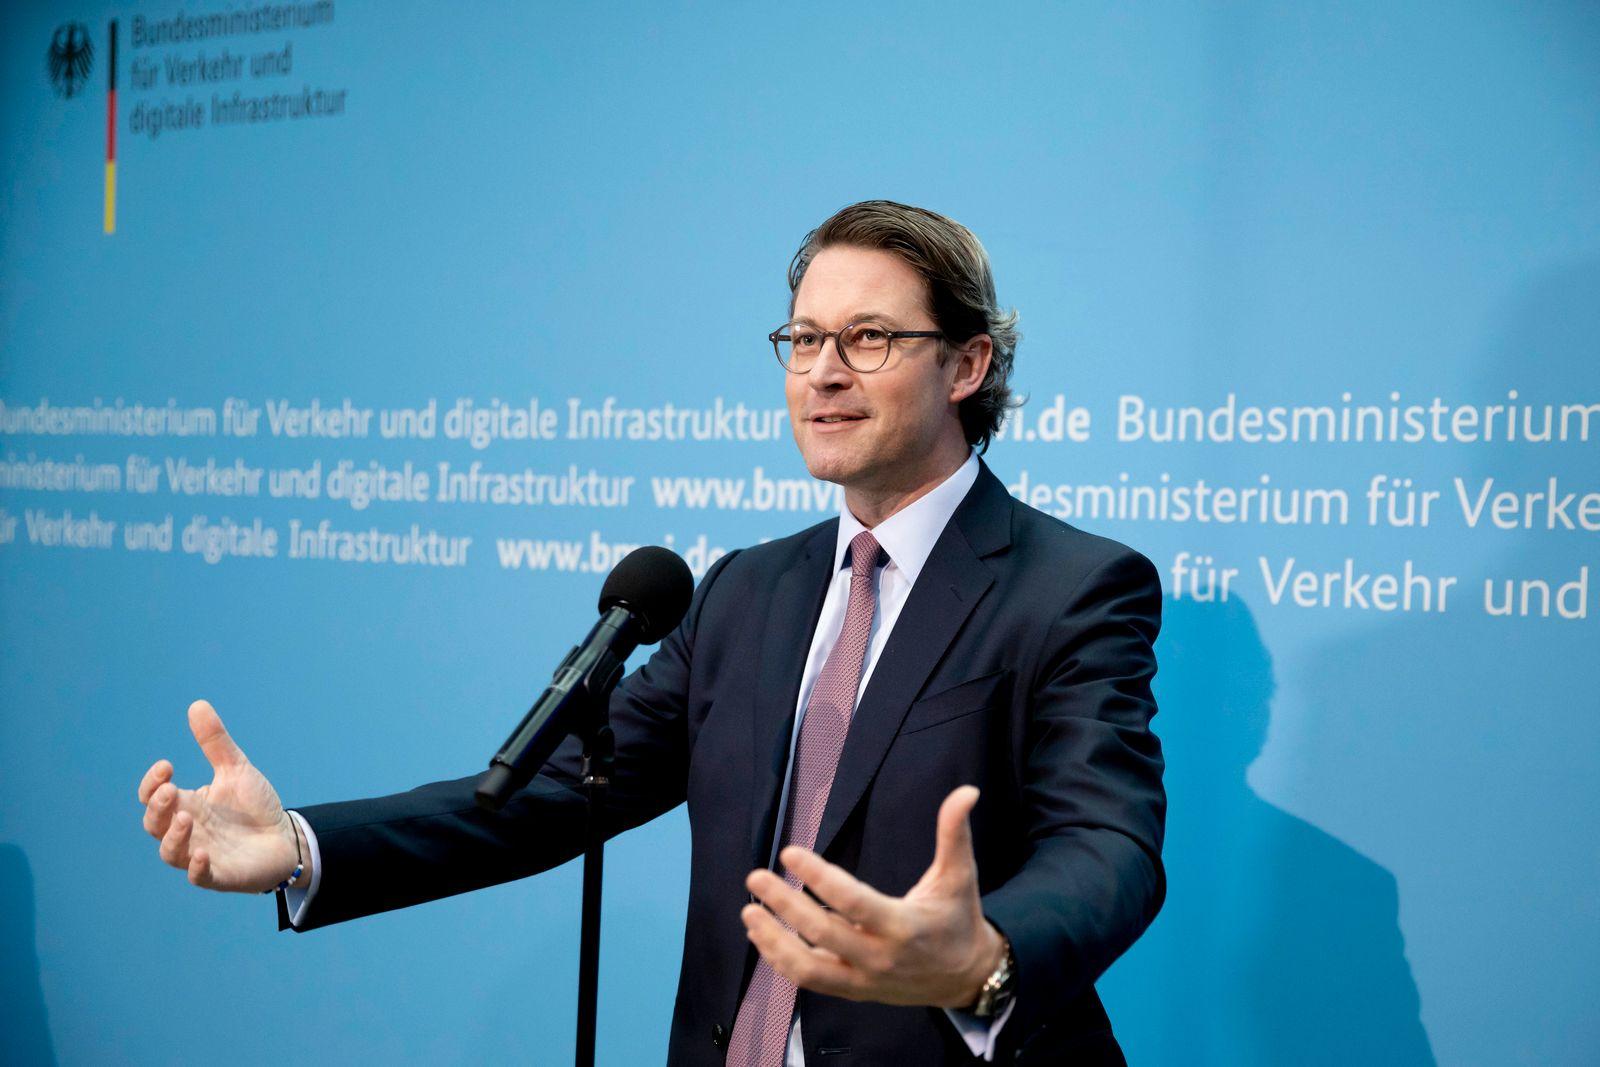 Verkehrsminister Scheuer zu Tempolimit